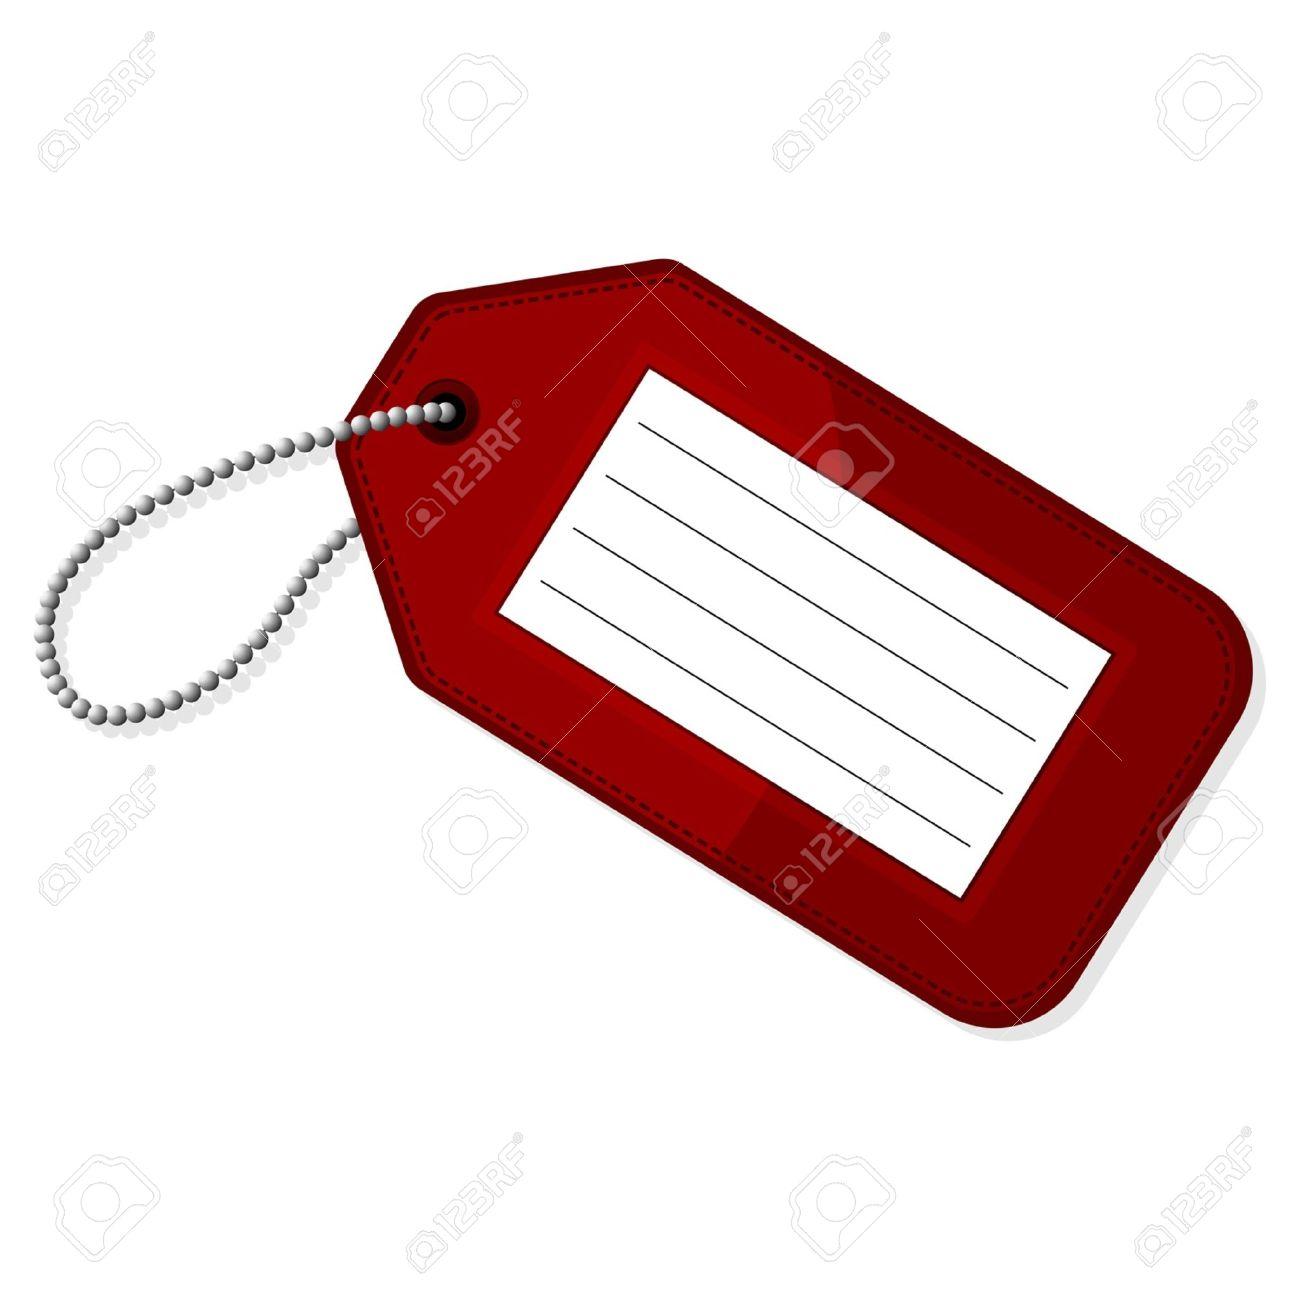 luggage tag: Red luggage tag.